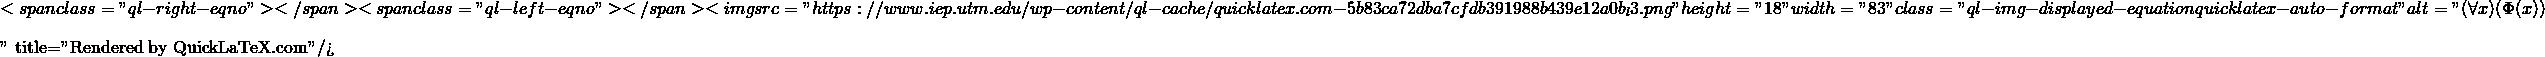 "\[<span class=""ql-right-eqno"">   </span><span class=""ql-left-eqno"">   </span><img src=""https://www.iep.utm.edu/wp-content/ql-cache/quicklatex.com-5b83ca72dba7cfdb391988b439e12a0b_l3.png"" height=""18"" width=""83"" class=""ql-img-displayed-equation quicklatex-auto-format"" alt=""\begin{equation*} (\forall x)(\Phi(x)) \end{equation*}"" title=""Rendered by QuickLaTeX.com""/>\]"